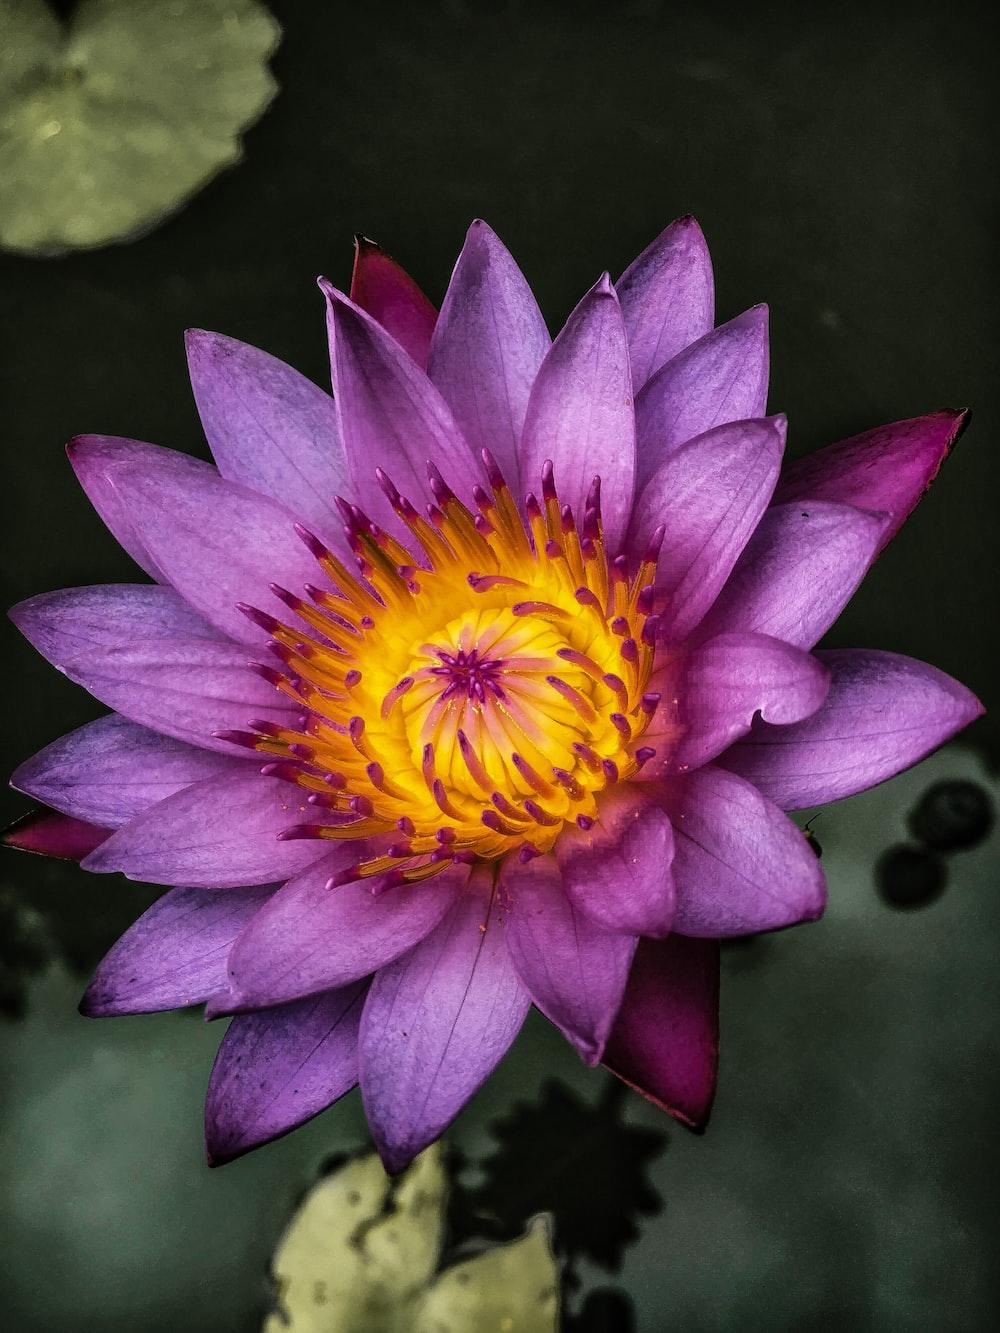 Top View Of Purple Lotus Flower Photo Free Plant Image On Unsplash